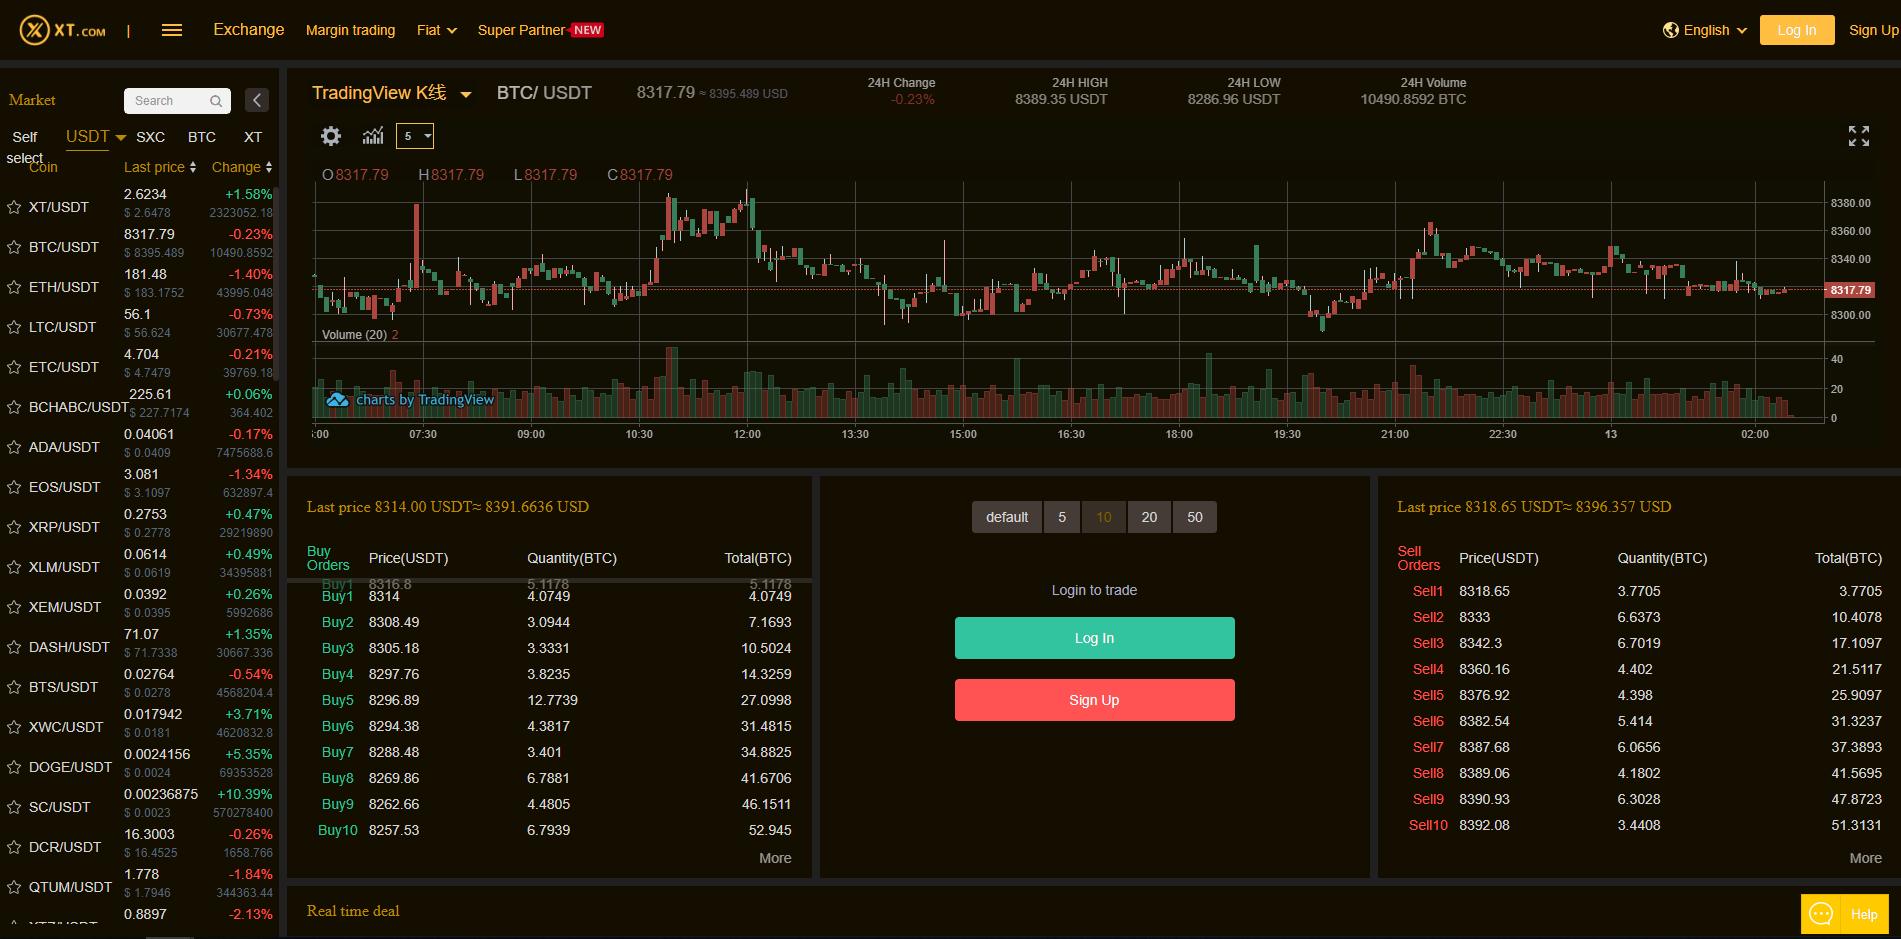 XT.com Trading View